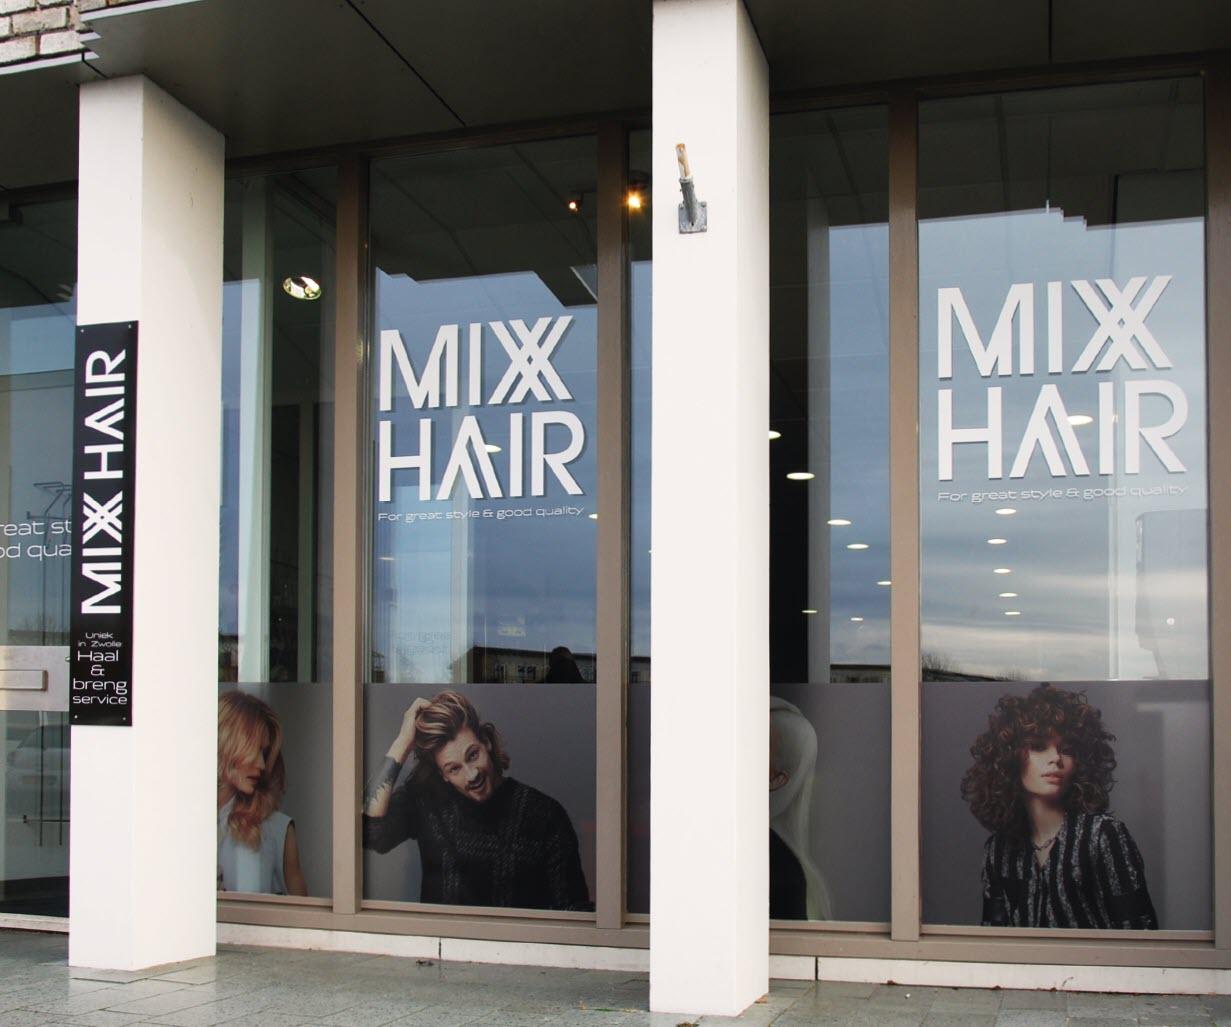 mixxhair-kapper-stadshagen-zwolle